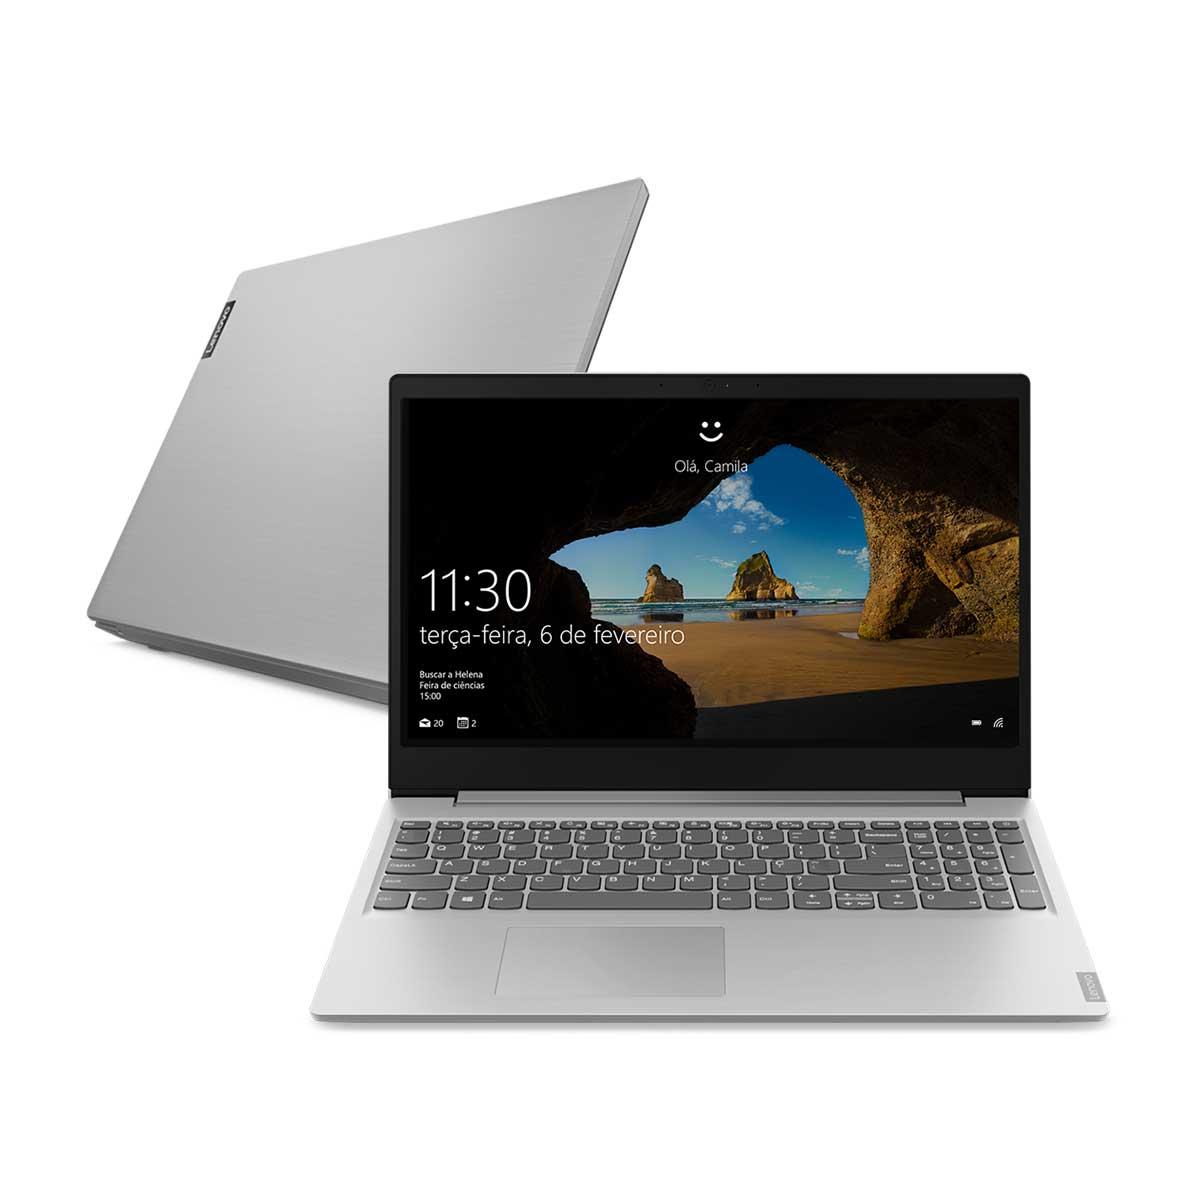 "Menor preço em Notebook Ultrafino Lenovo Ideapad Ryzen 3-3200U 8GB 256GB SSD Tela 15.6"" Windows 10 S145 81V7000CBR"